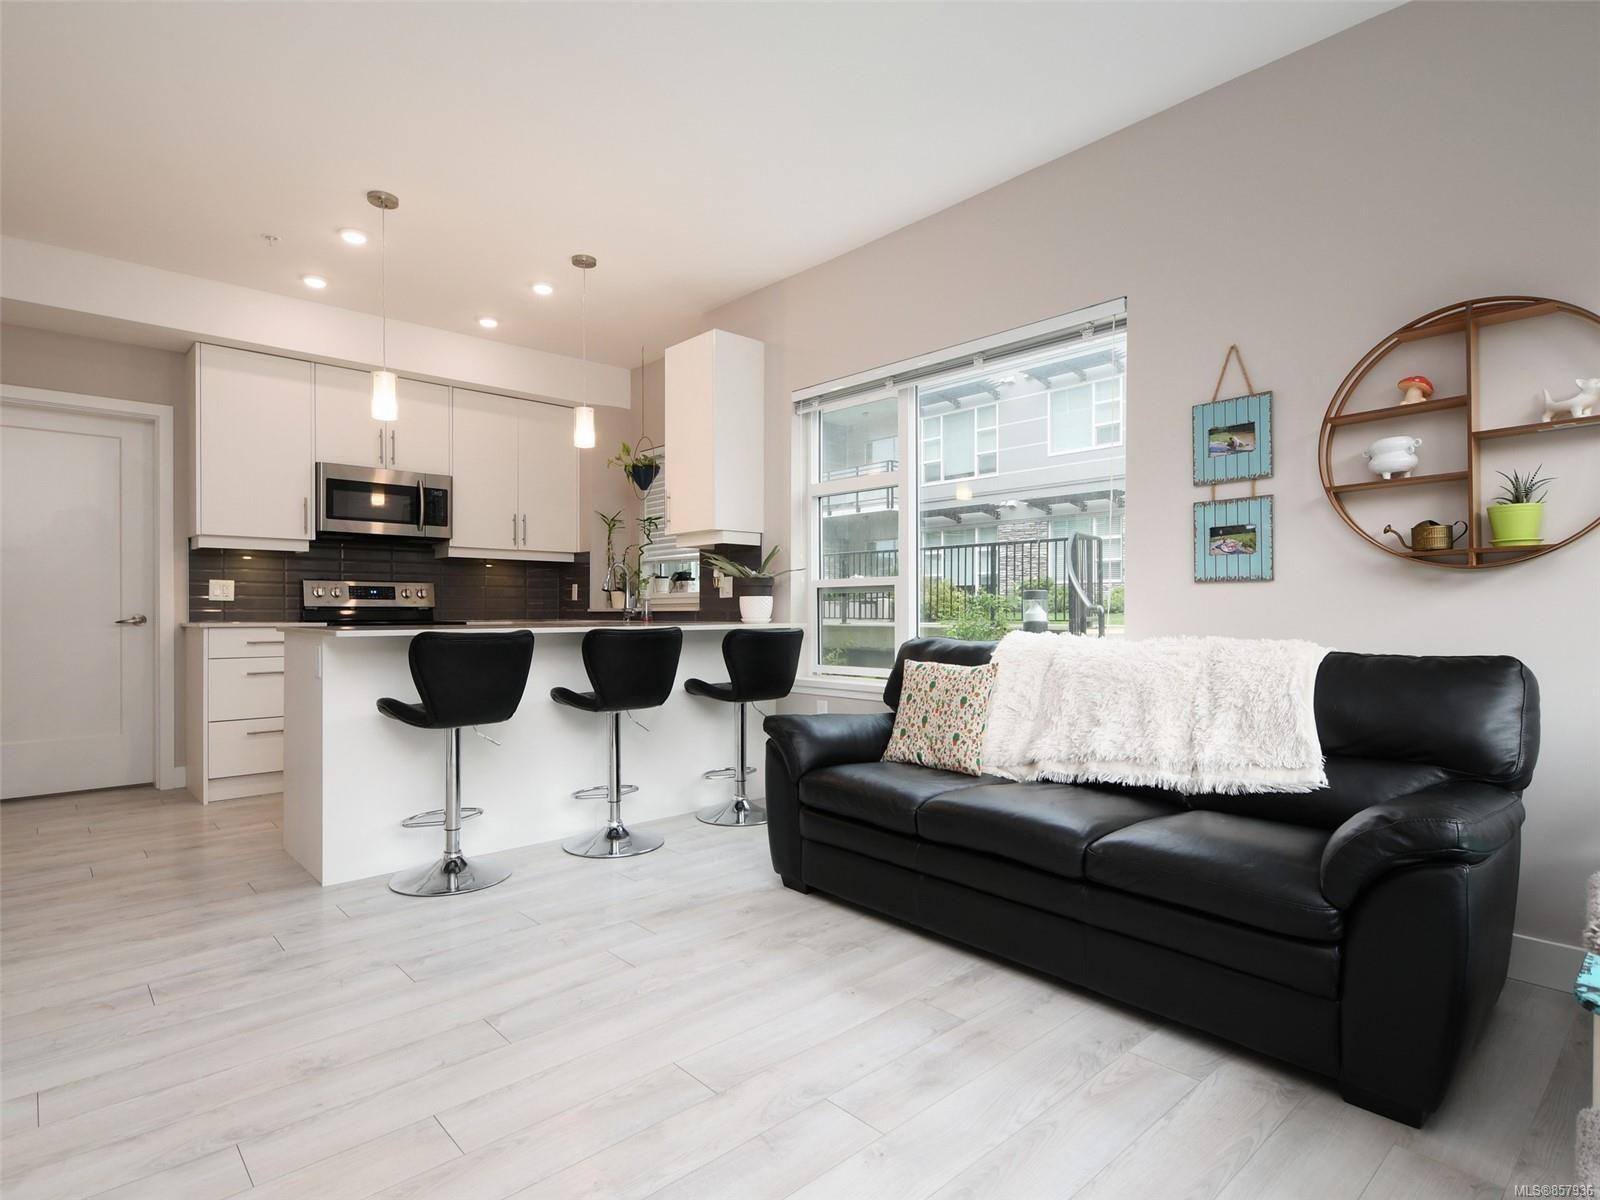 Photo 4: Photos: 103 1020 Inverness Rd in Saanich: SE Quadra Condo for sale (Saanich East)  : MLS®# 857936